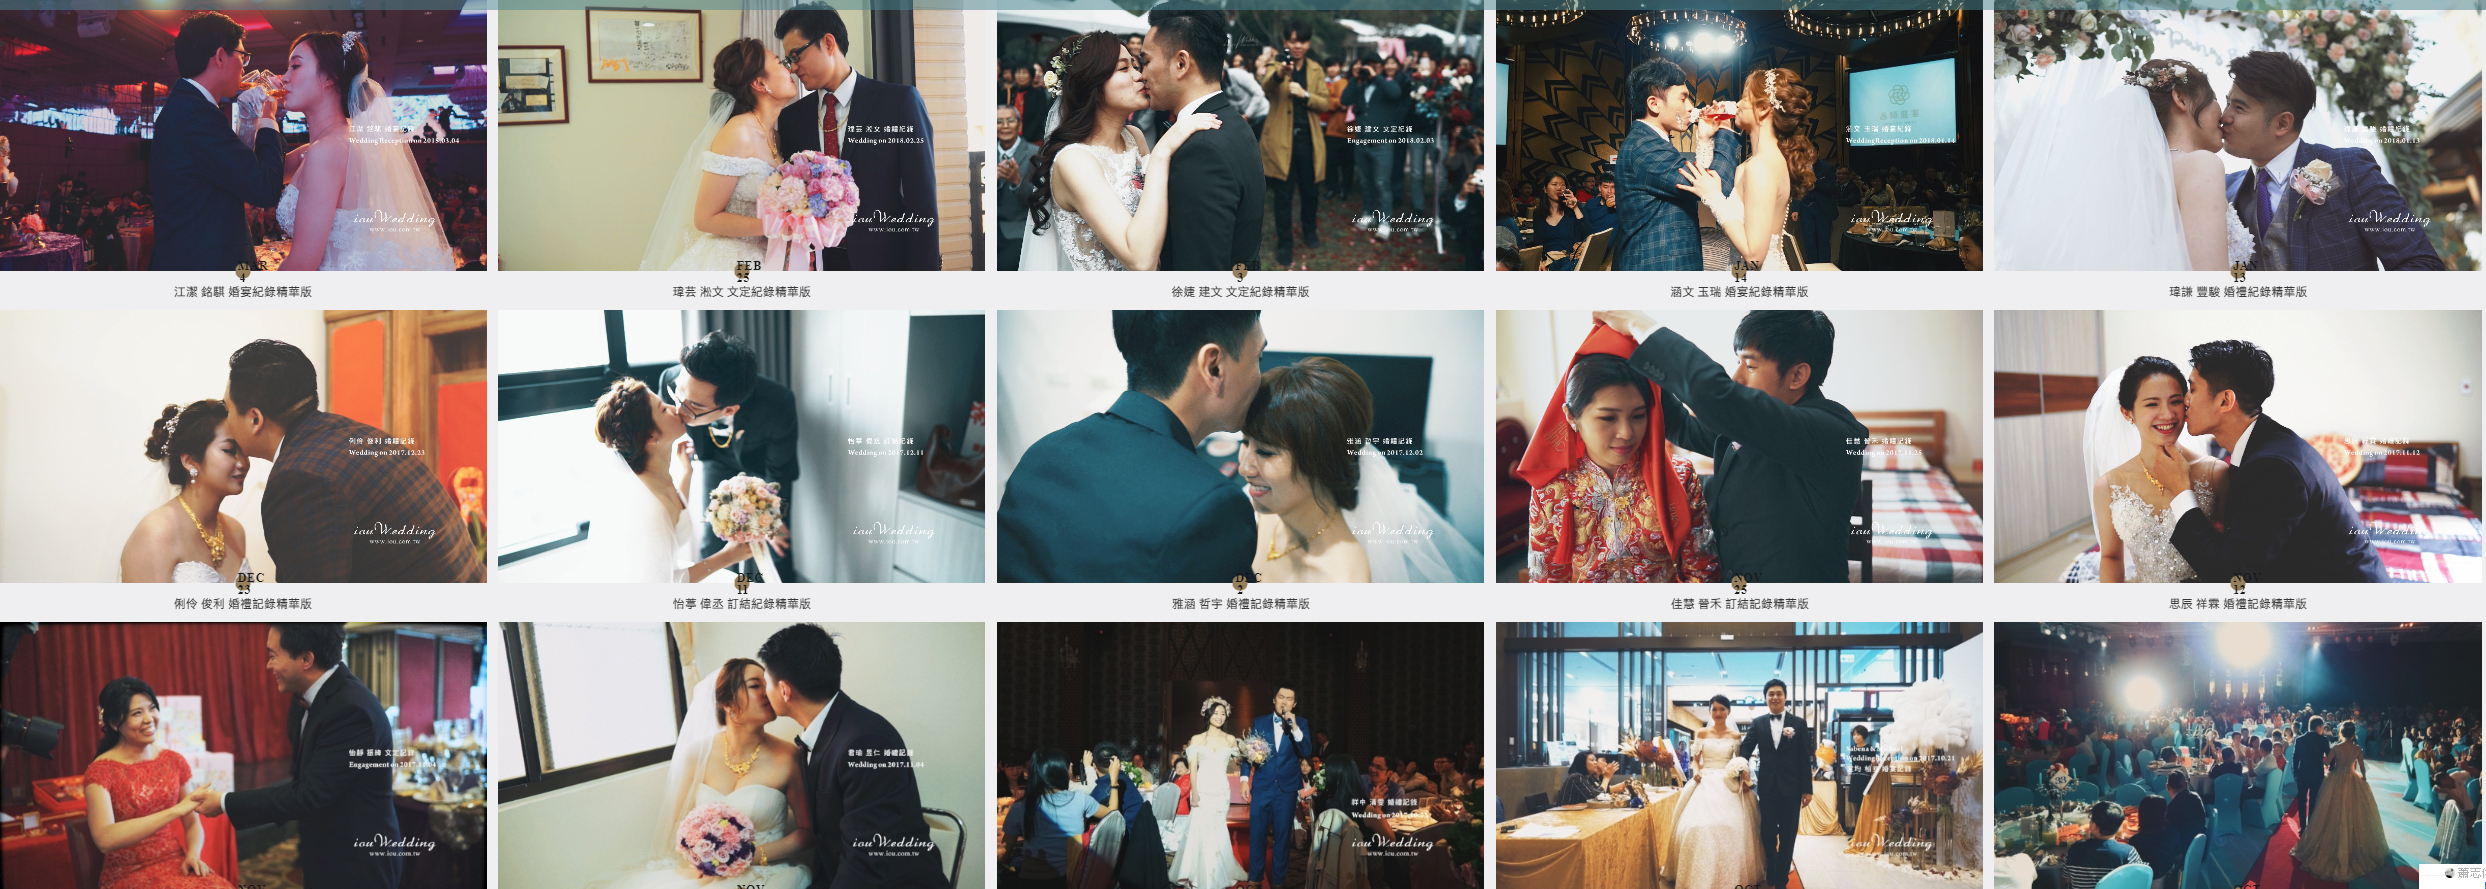 WeddingStories - 新人專屬的婚禮故事